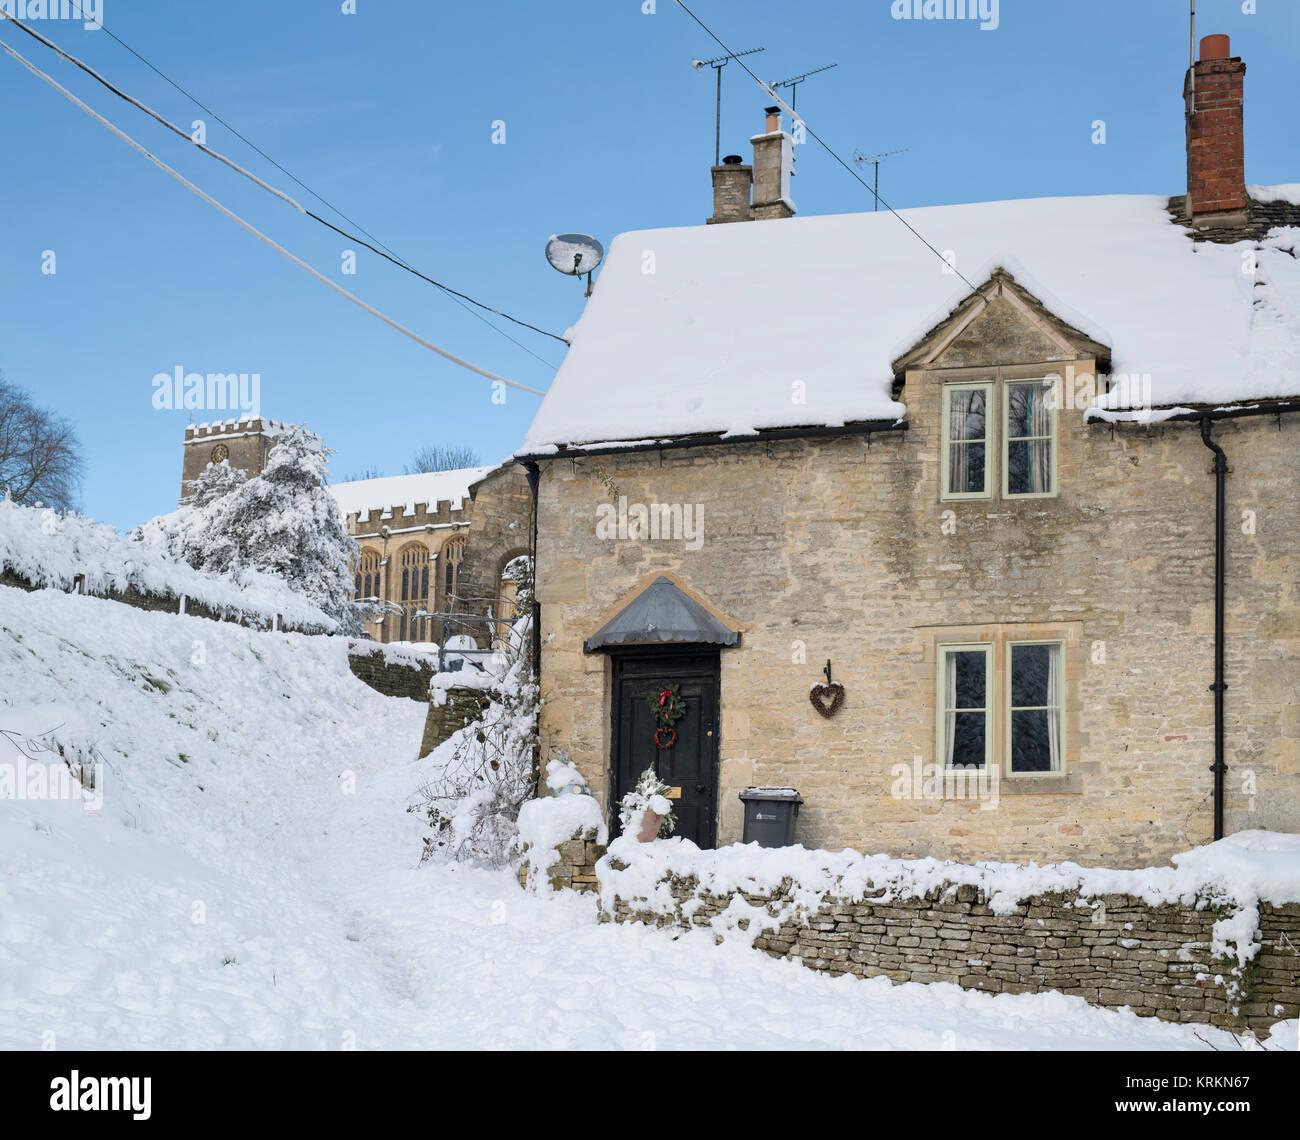 Snow England Cottage Christmas Stock Photos Amp Snow England